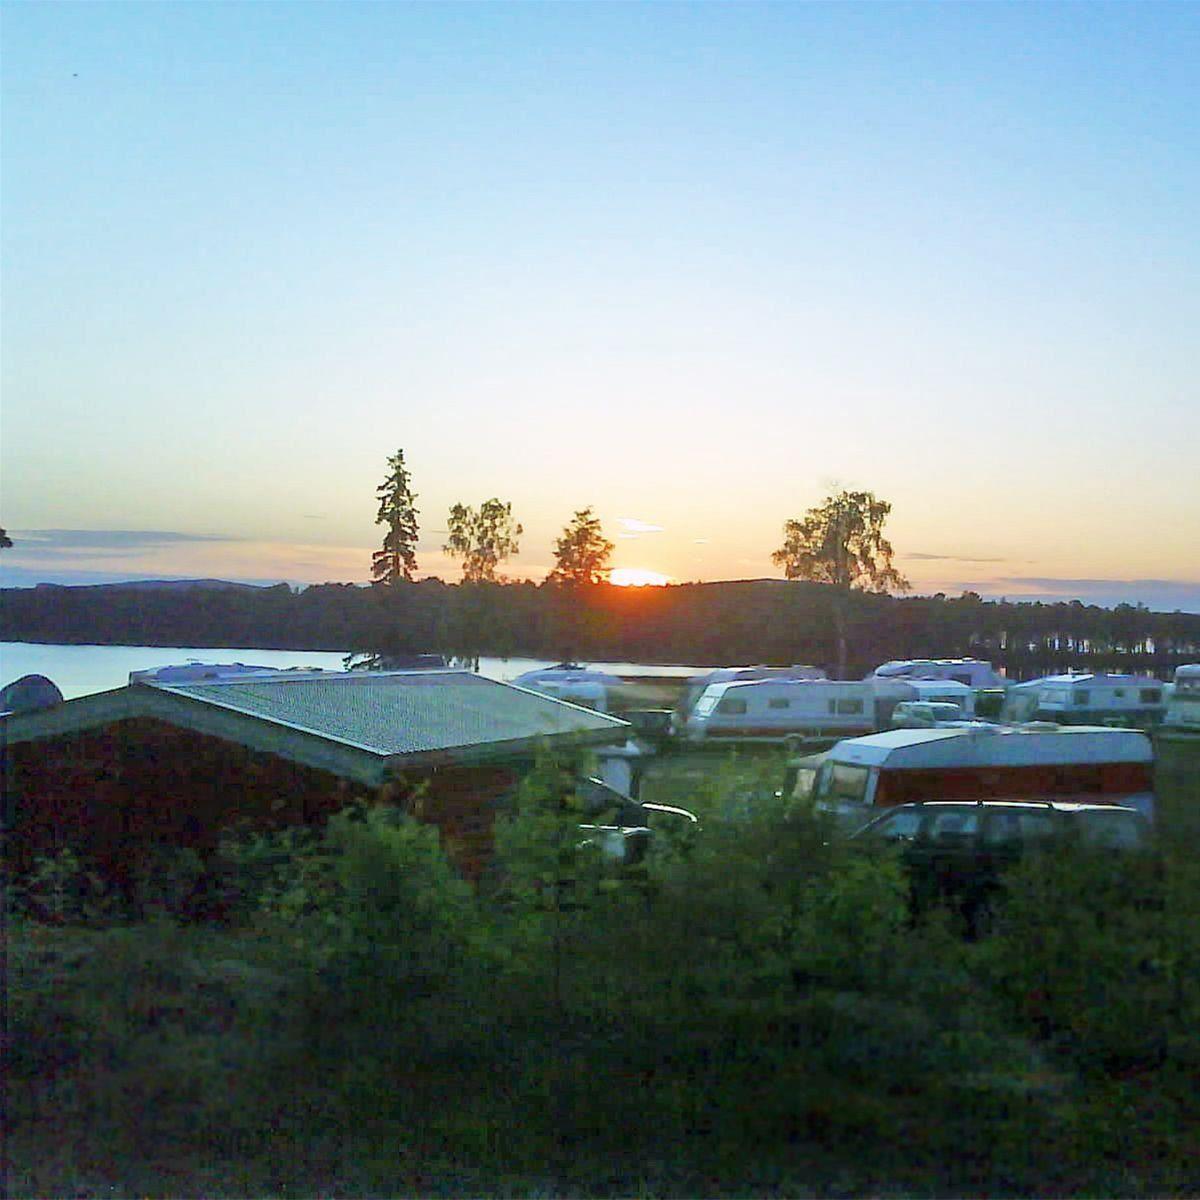 Foto: Guniris Jonasson, Omsjö Campsite